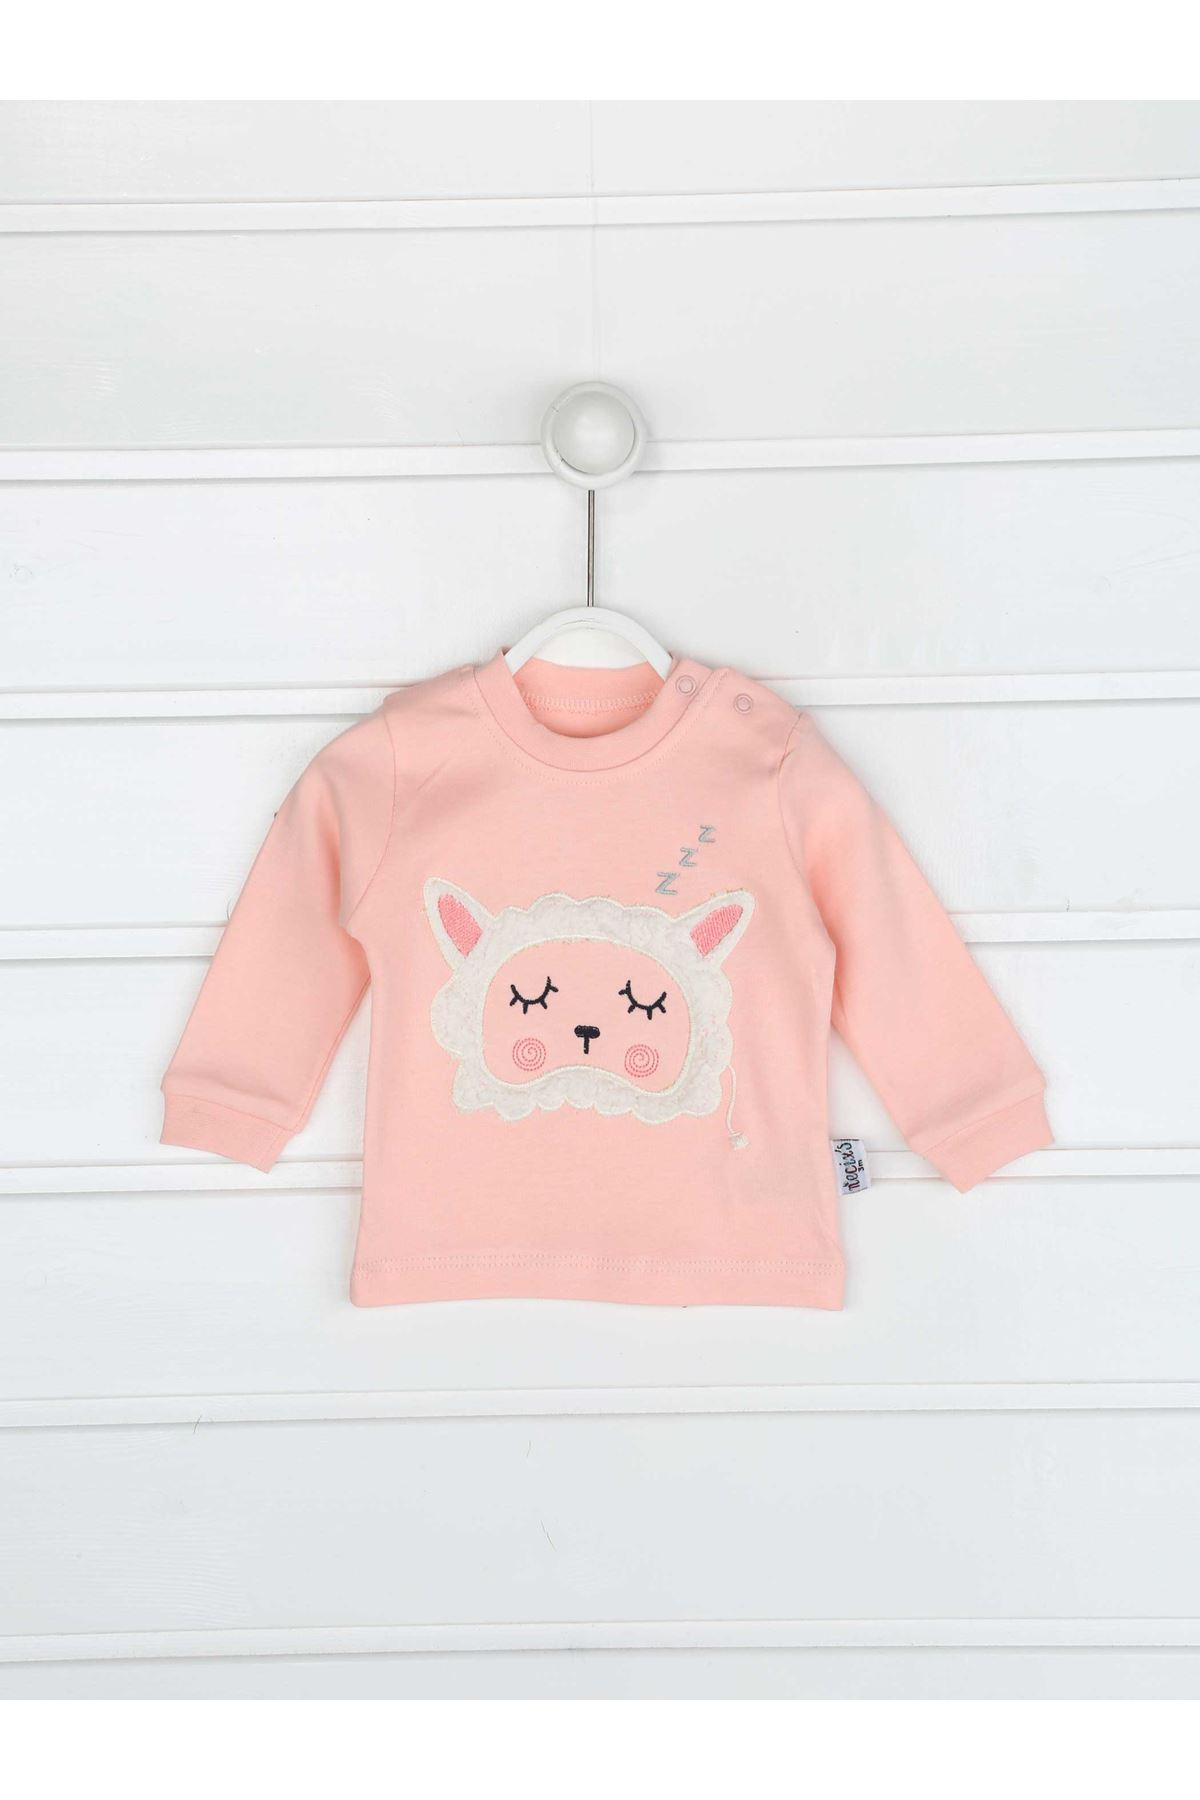 Powder Baby Girl Pajamas set